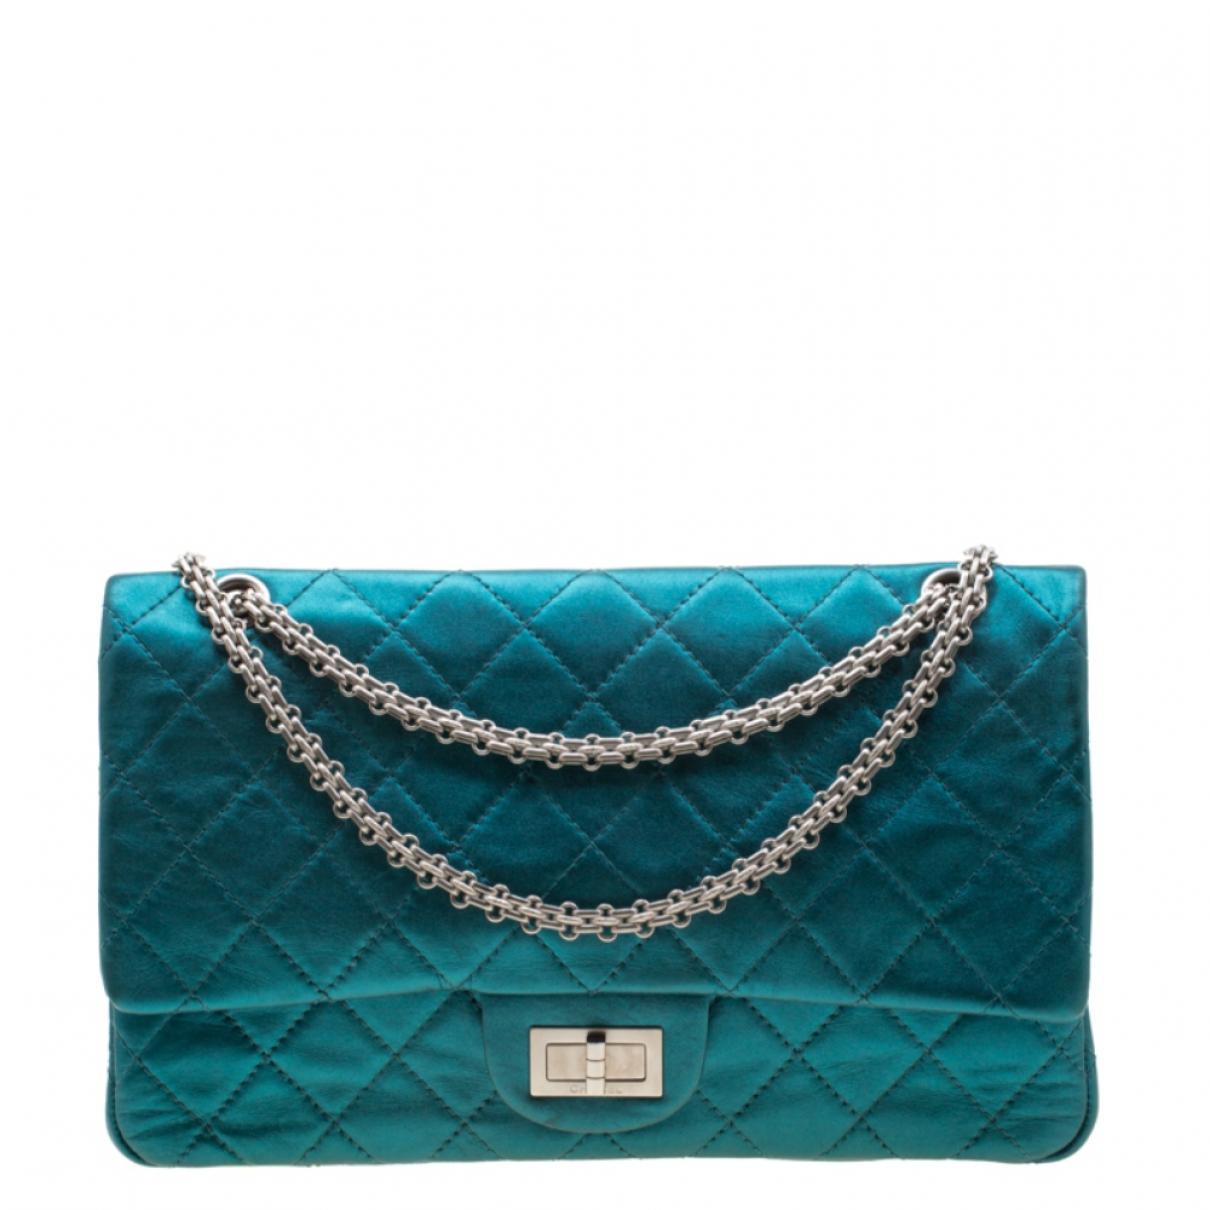 Chanel 2.55 Handtasche in Leder